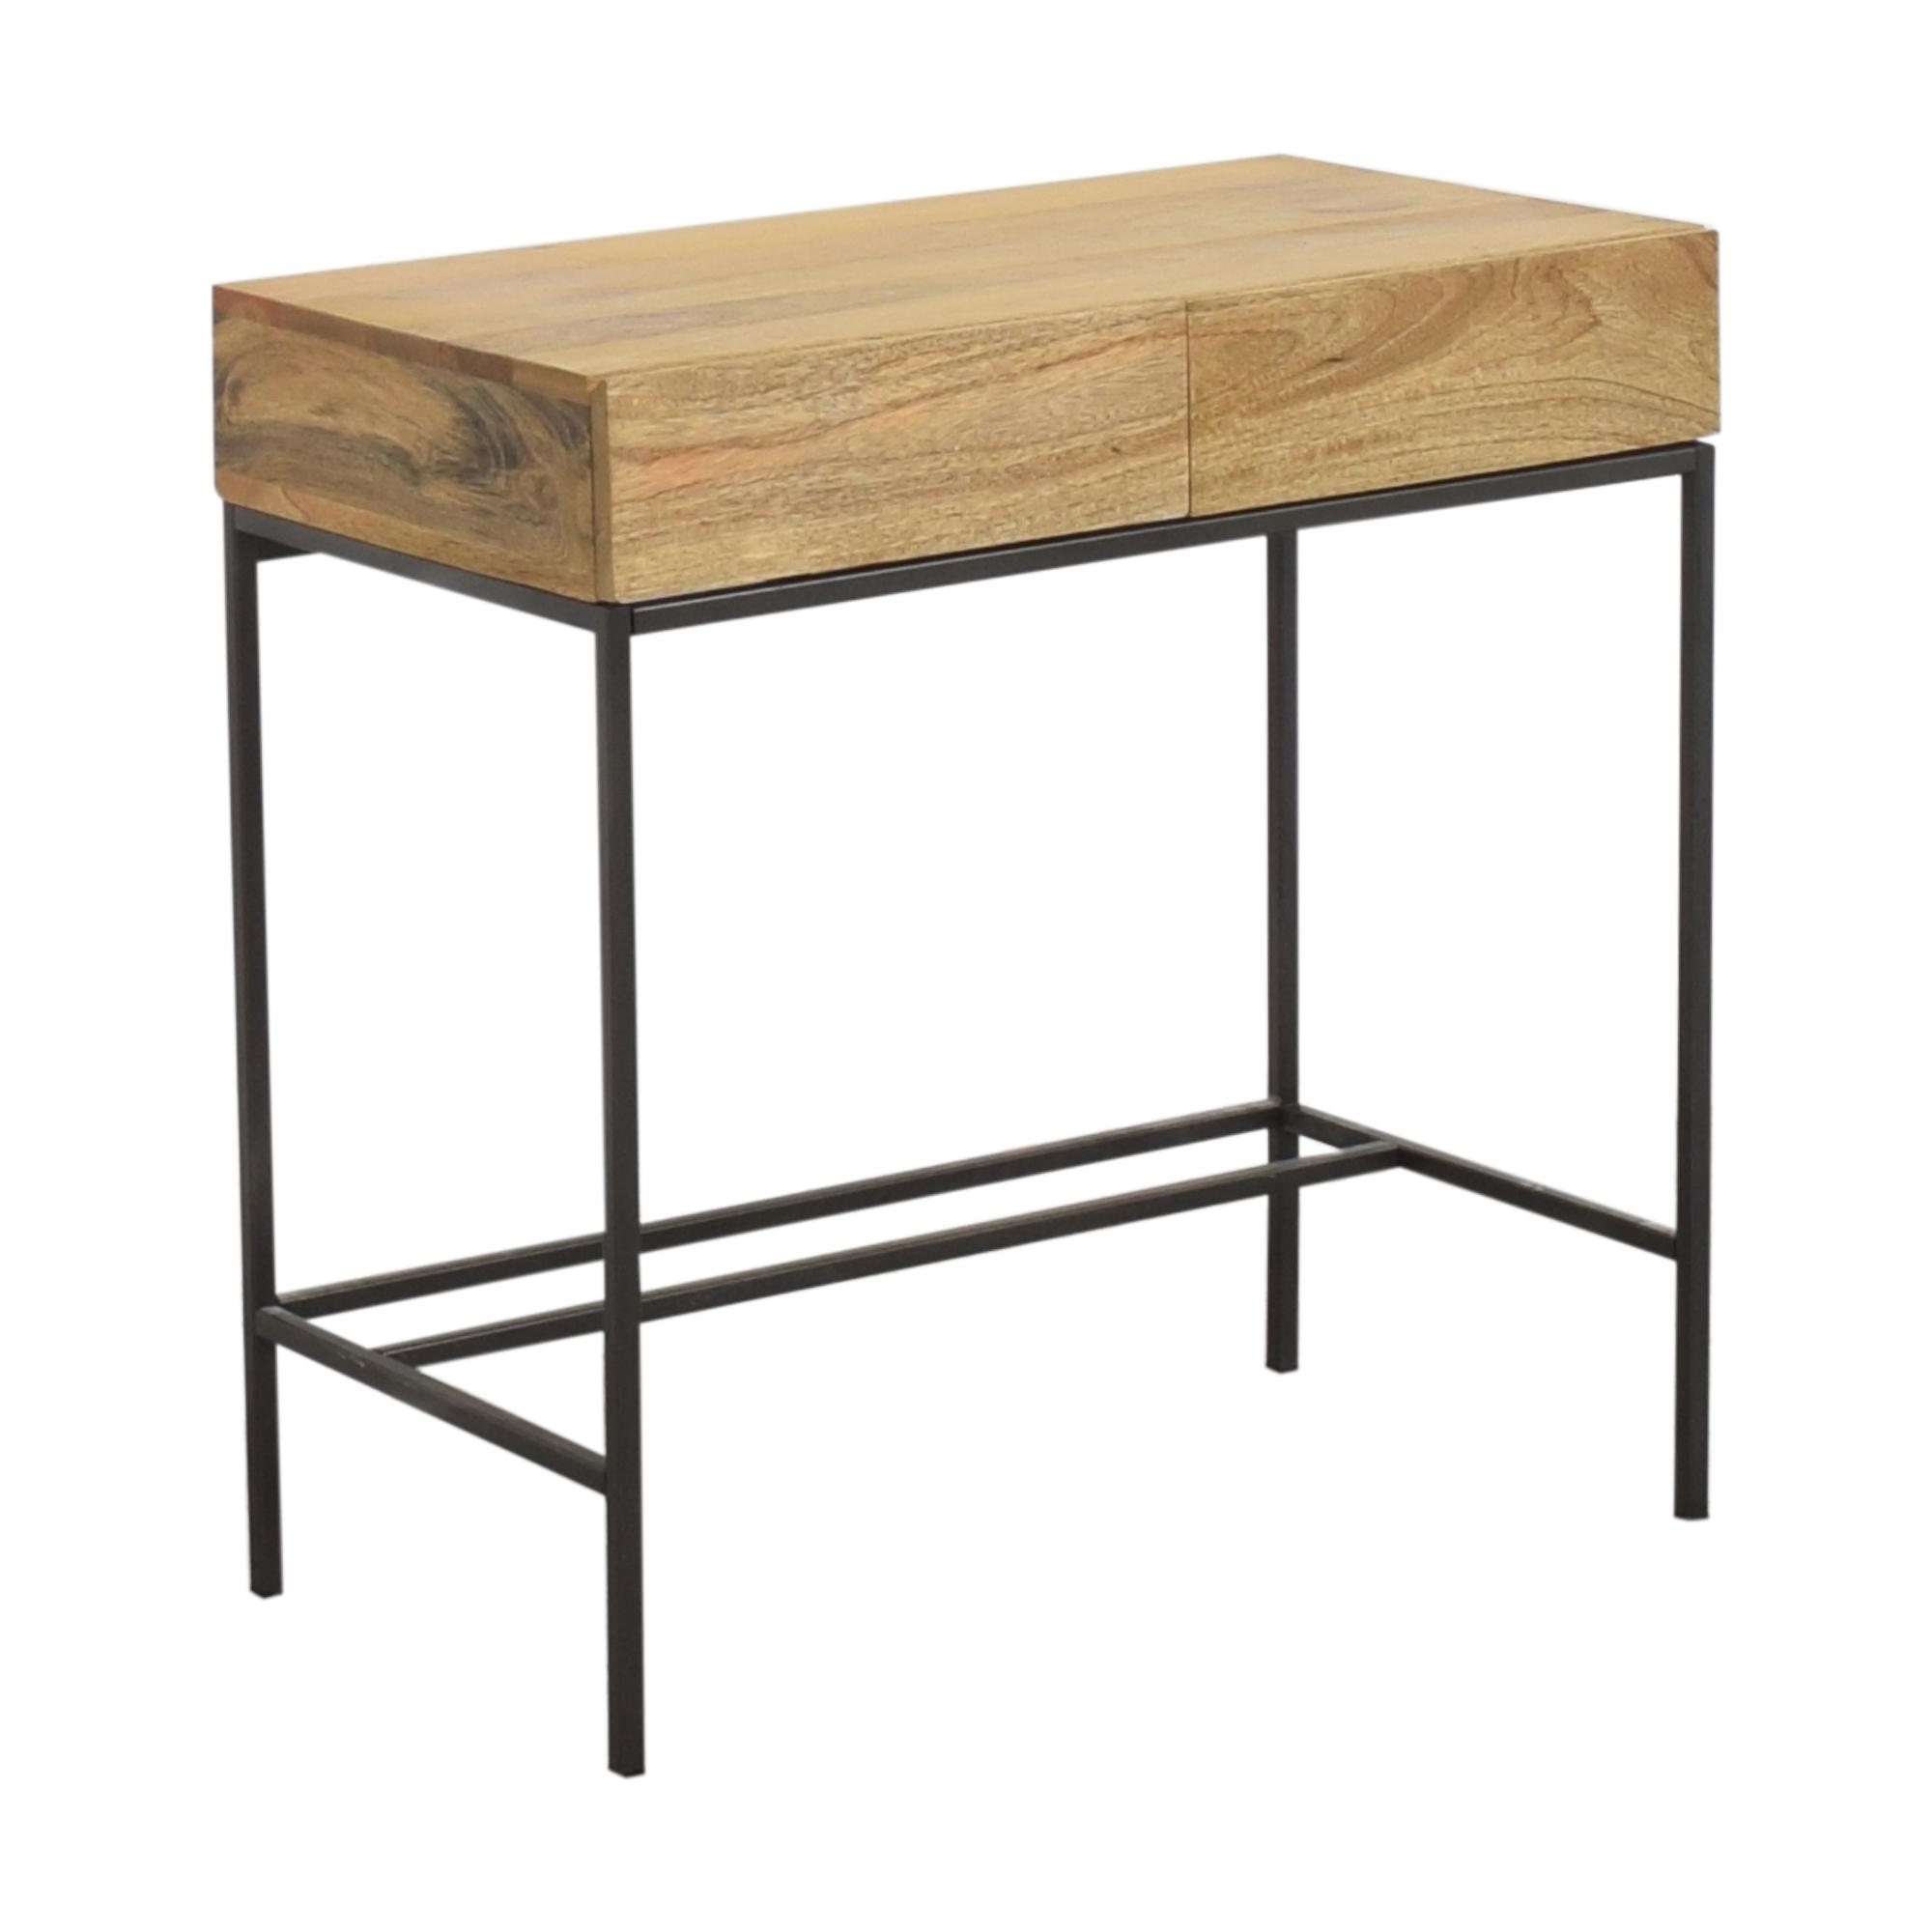 West Elm West Elm Industrial Storage Mini Desk ct